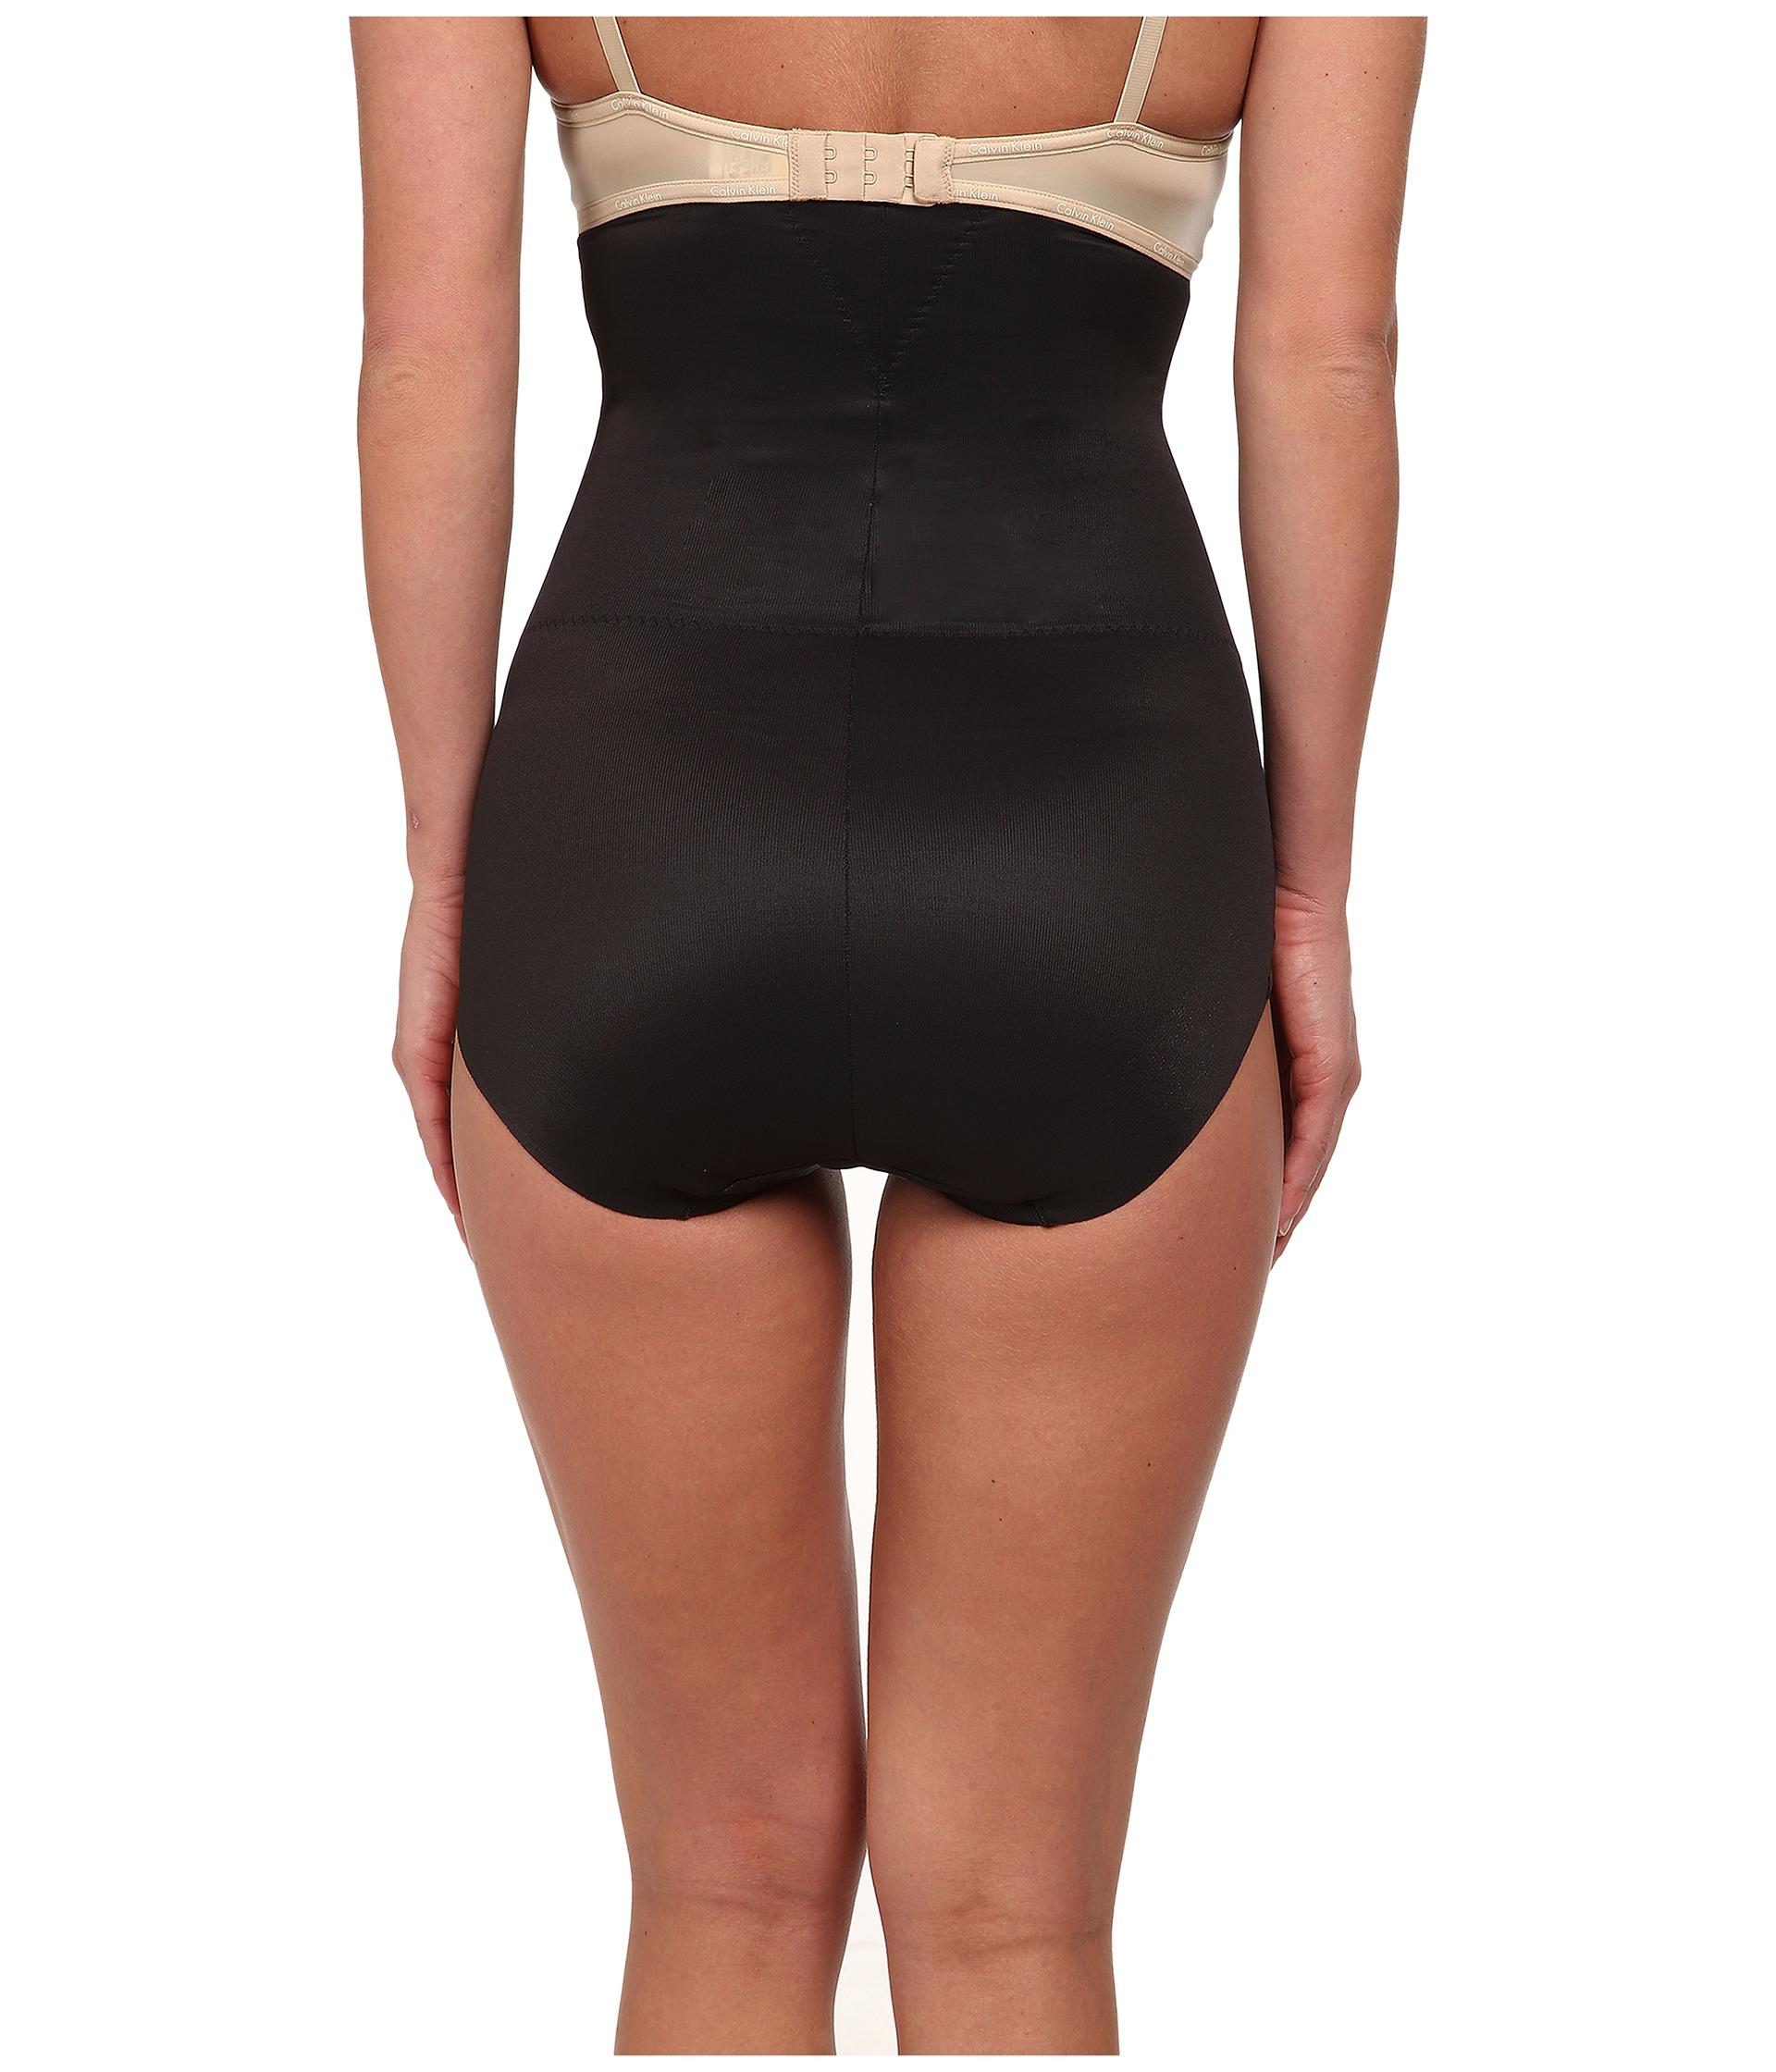 Miraclesuit Shapewear Long Torso High Waist Brief Black ...